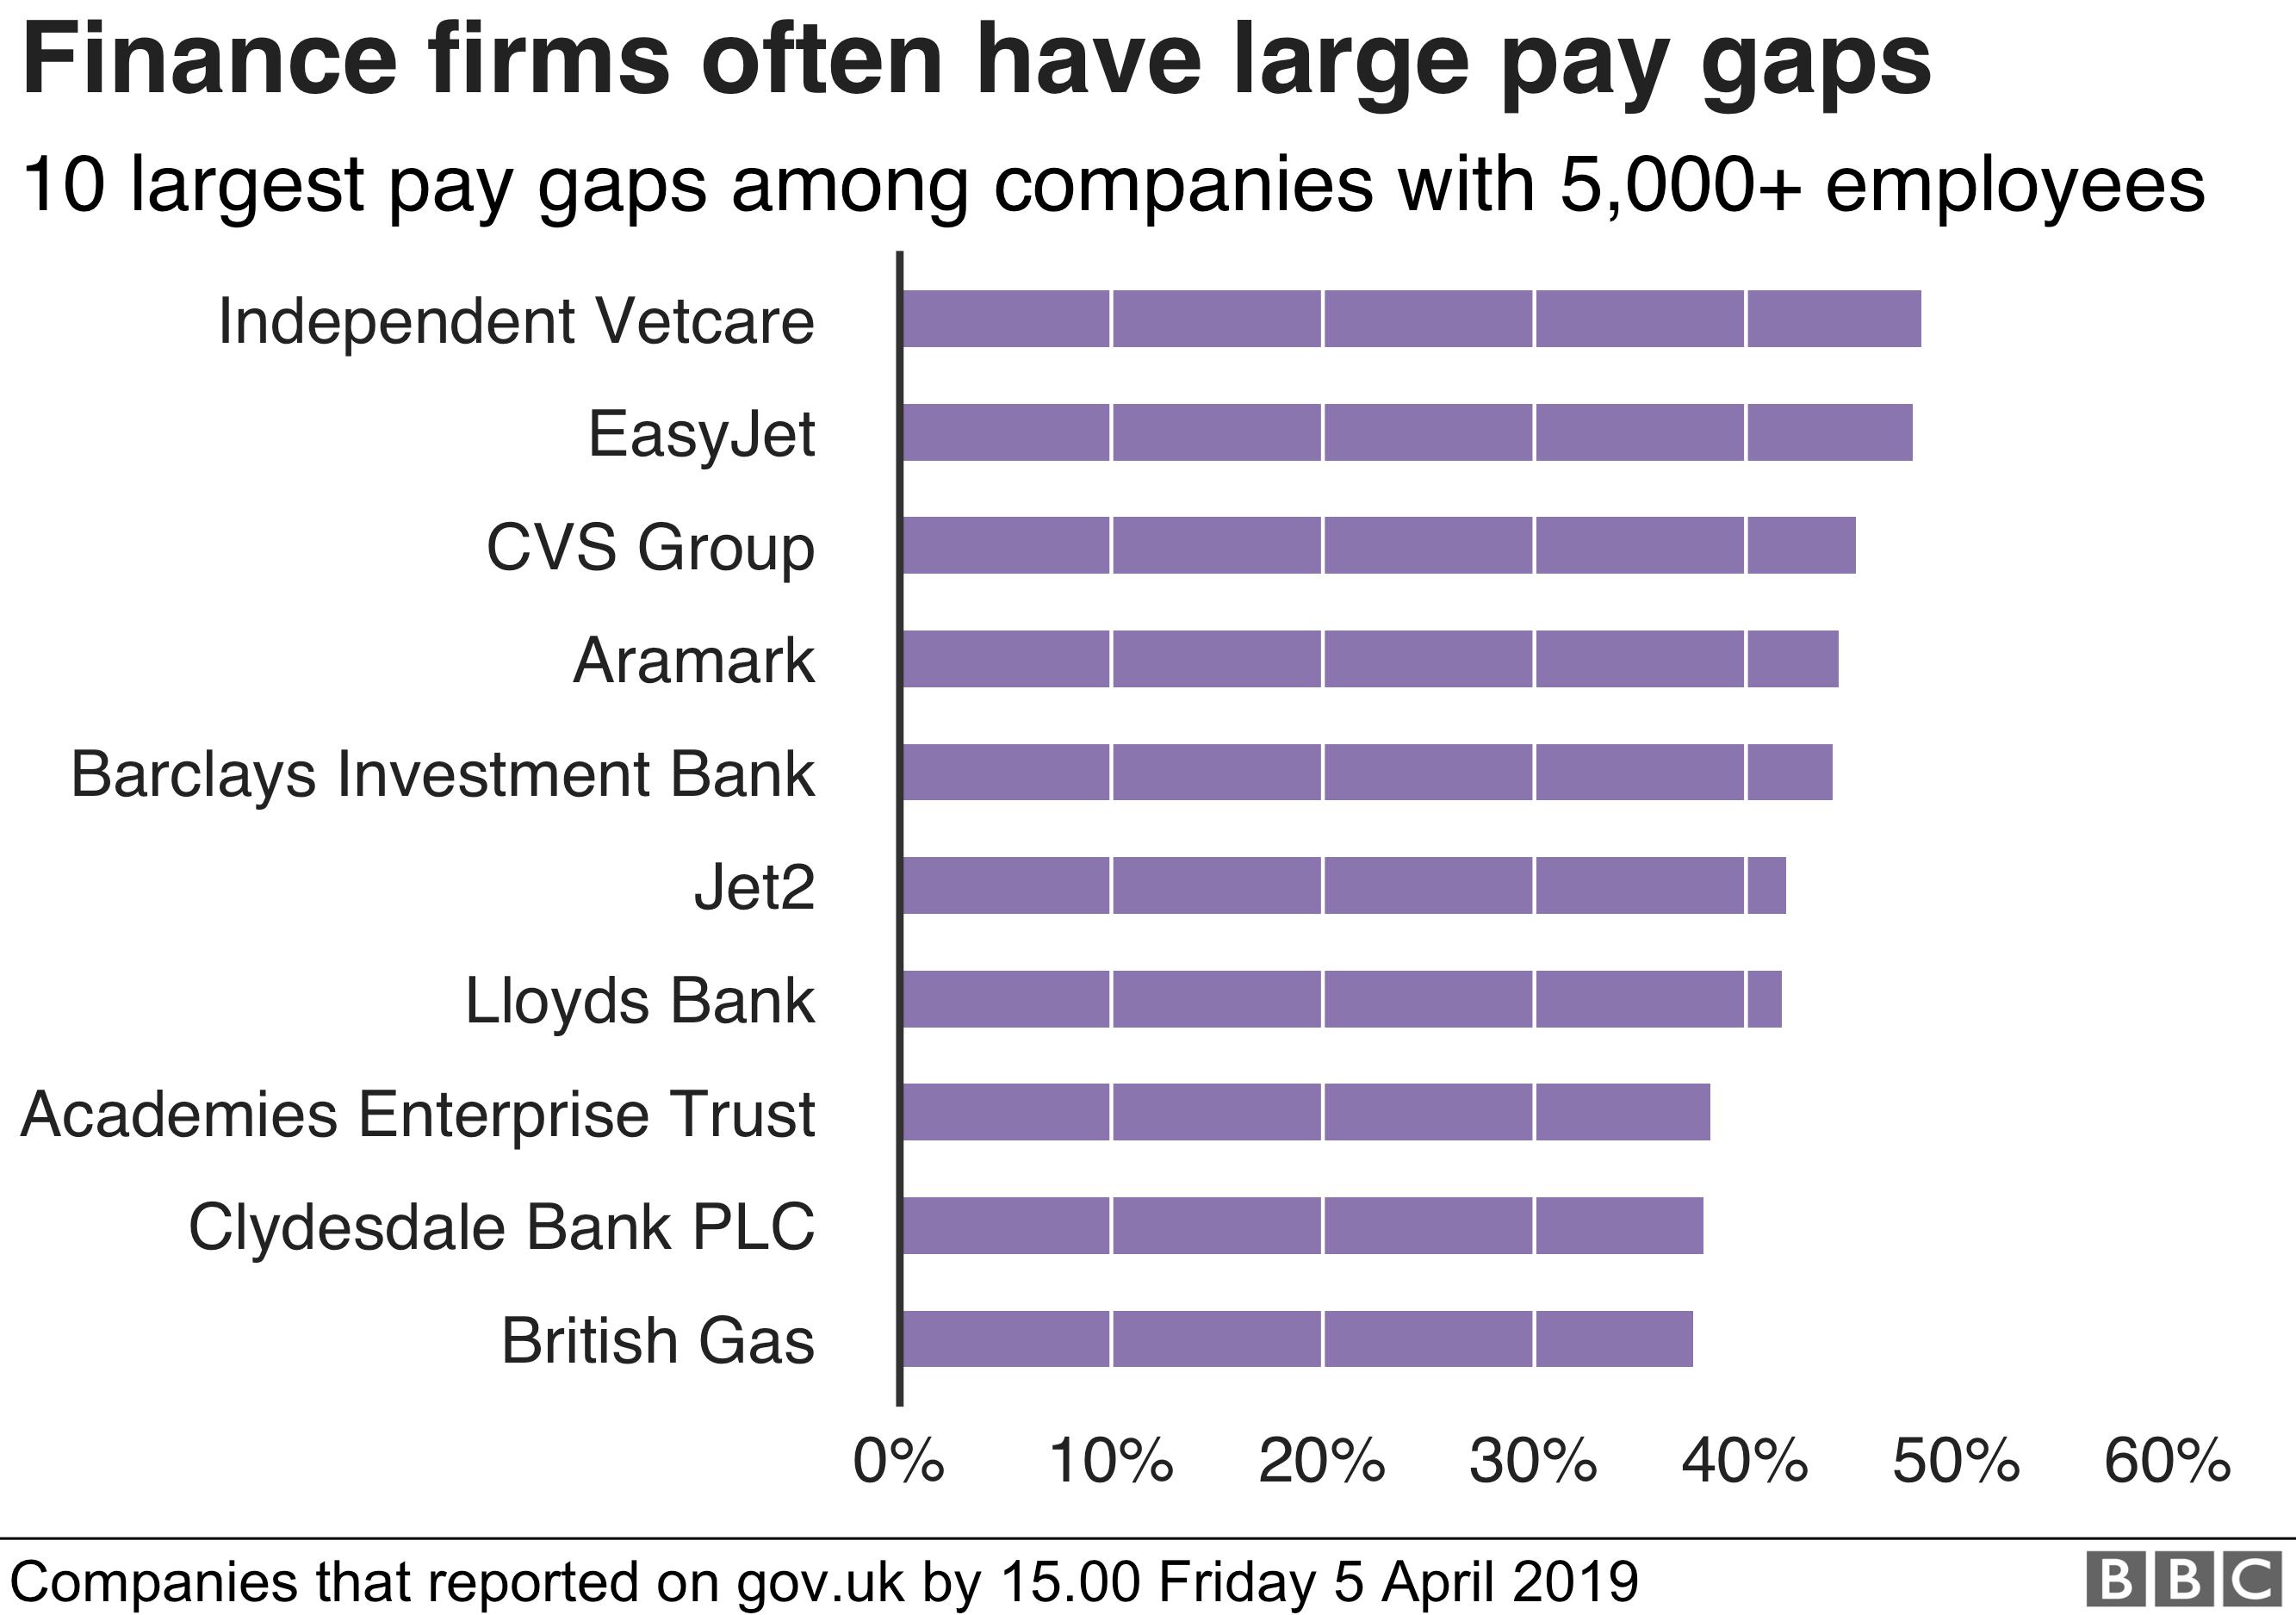 Biggest pay gap